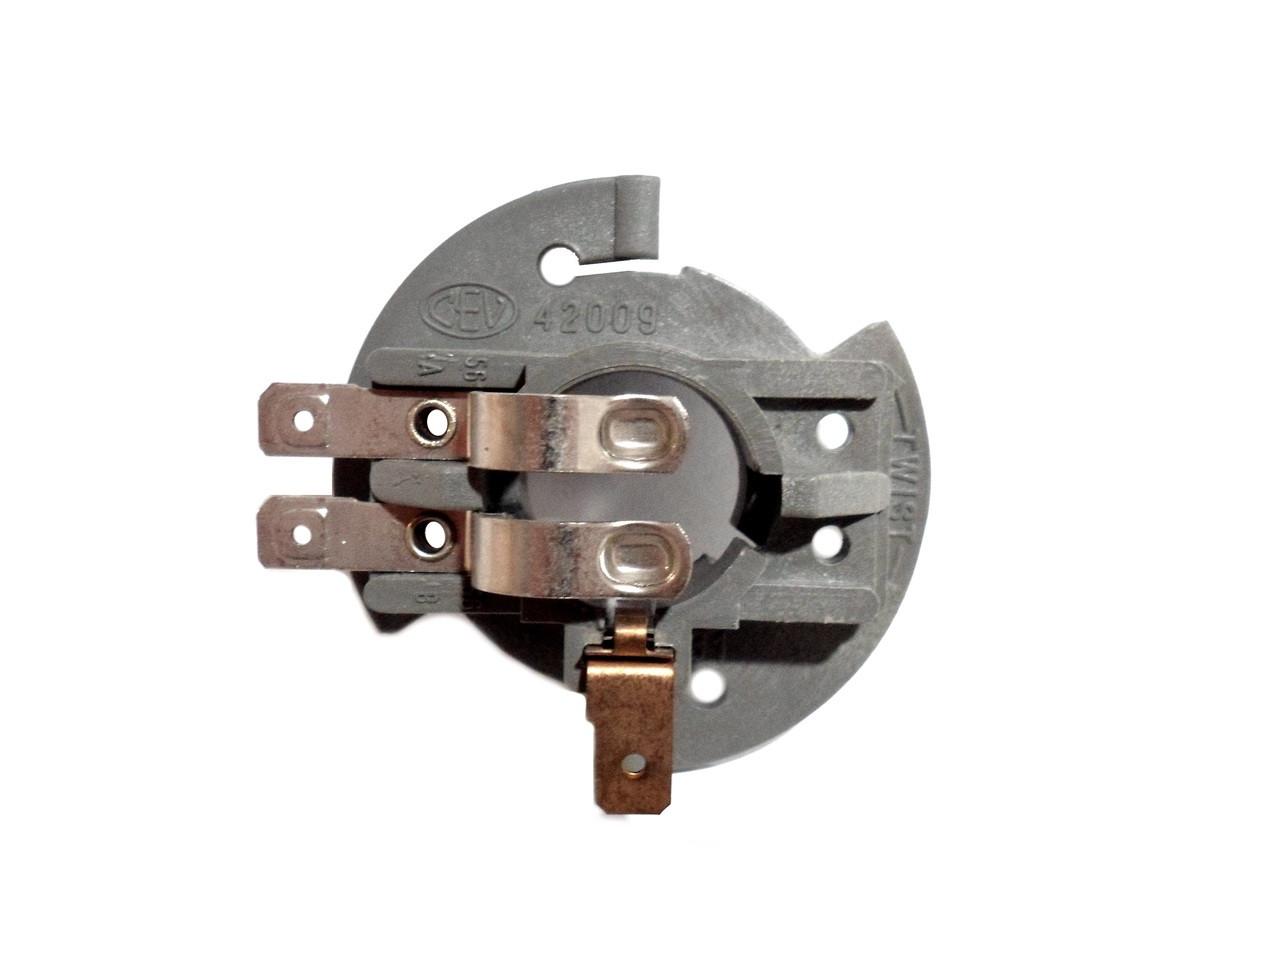 NOS Tomos / Kinetic CEV BA15D Moped Headlight Bulb Holder / Socket - 3 Prong